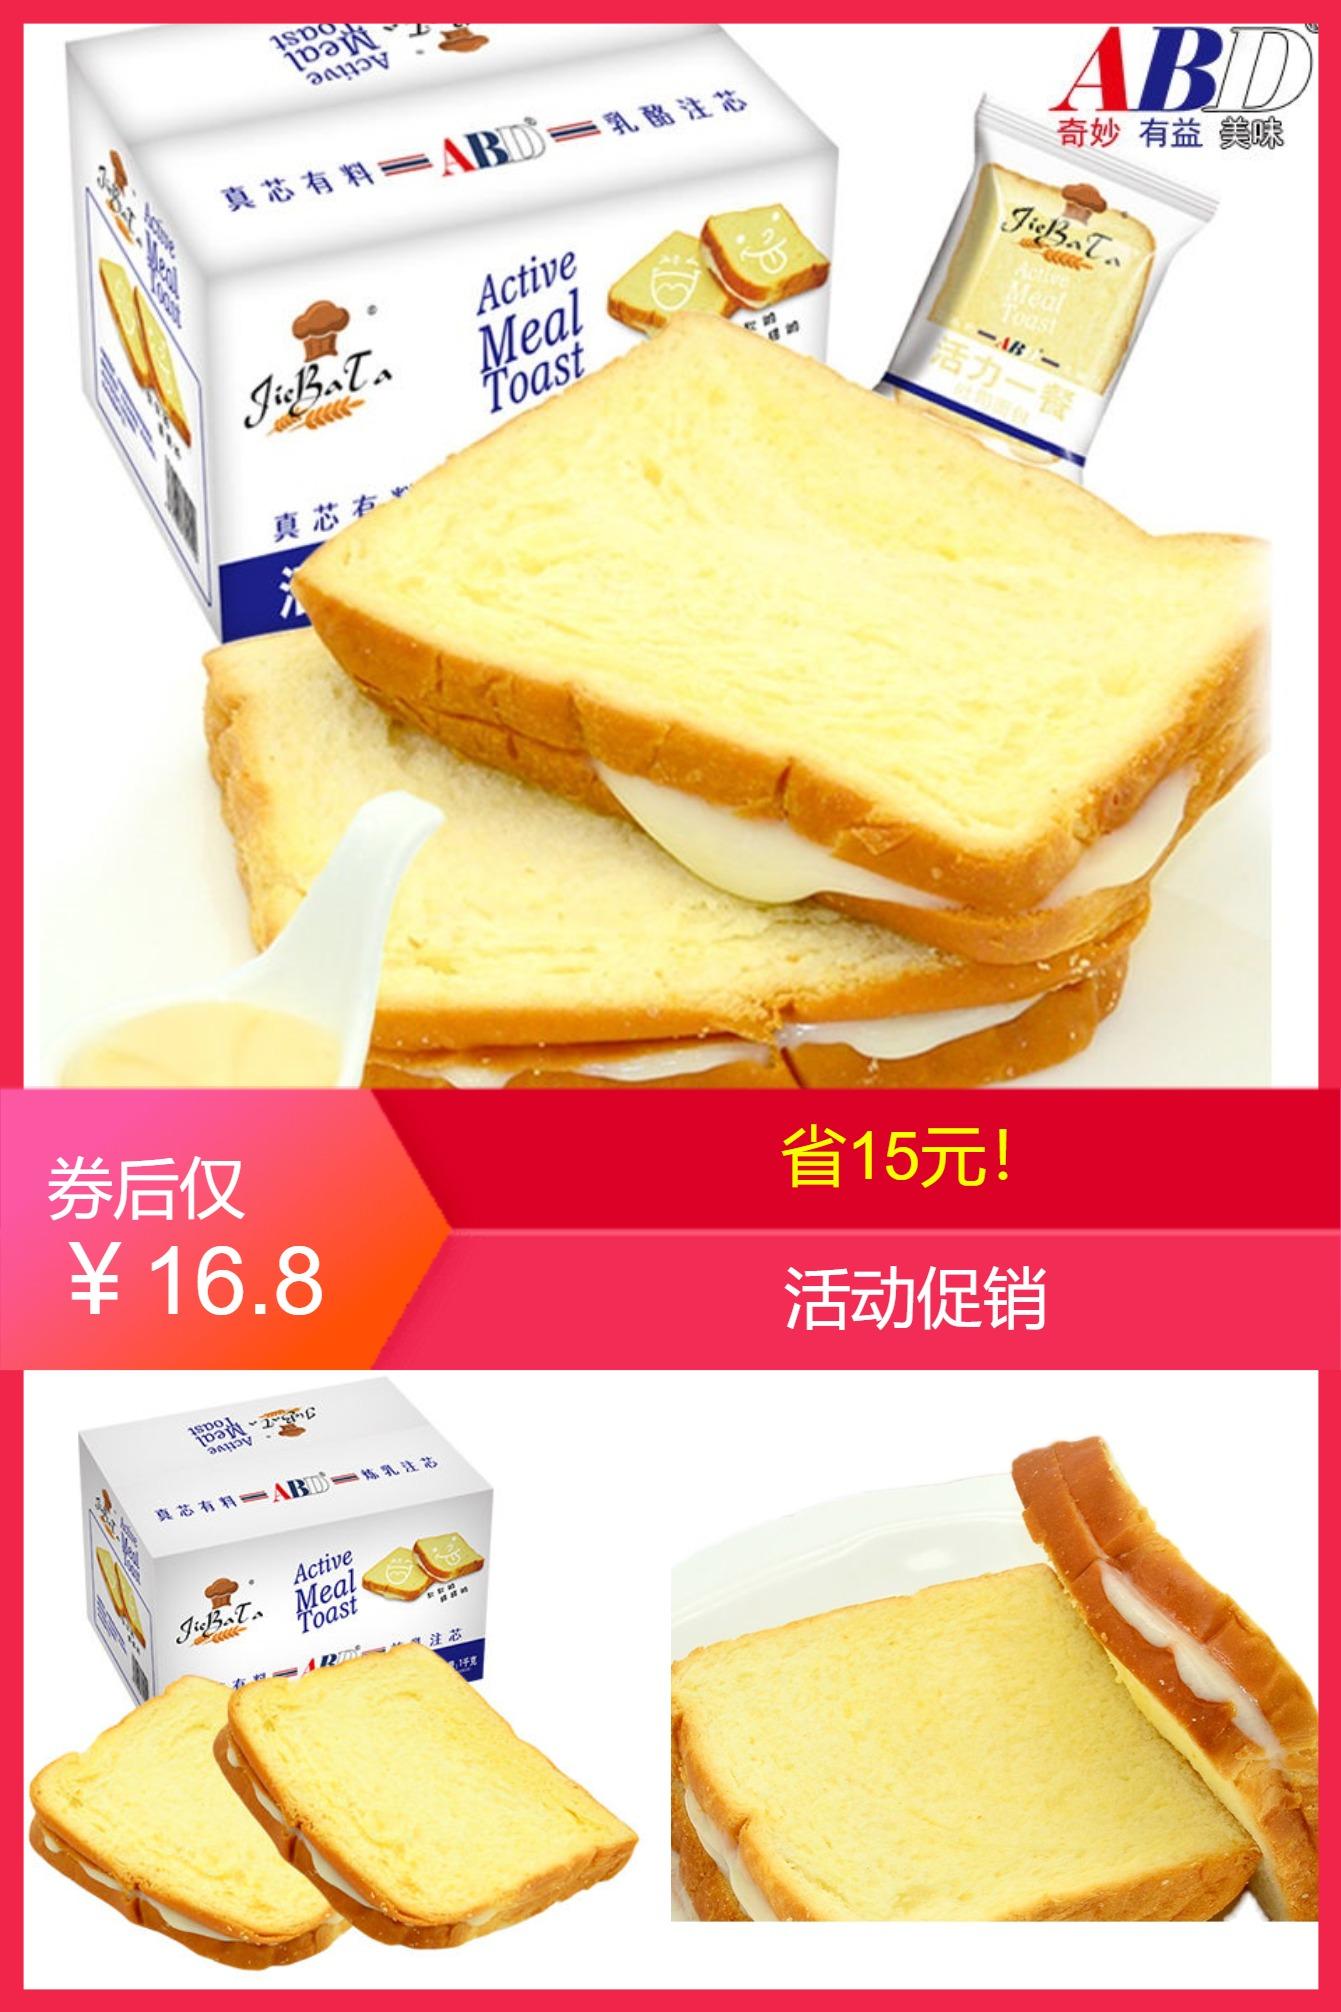 ABD奶酪吐司面包片夹心原味整箱早餐蛋糕价格/优惠_券后16.8元包邮